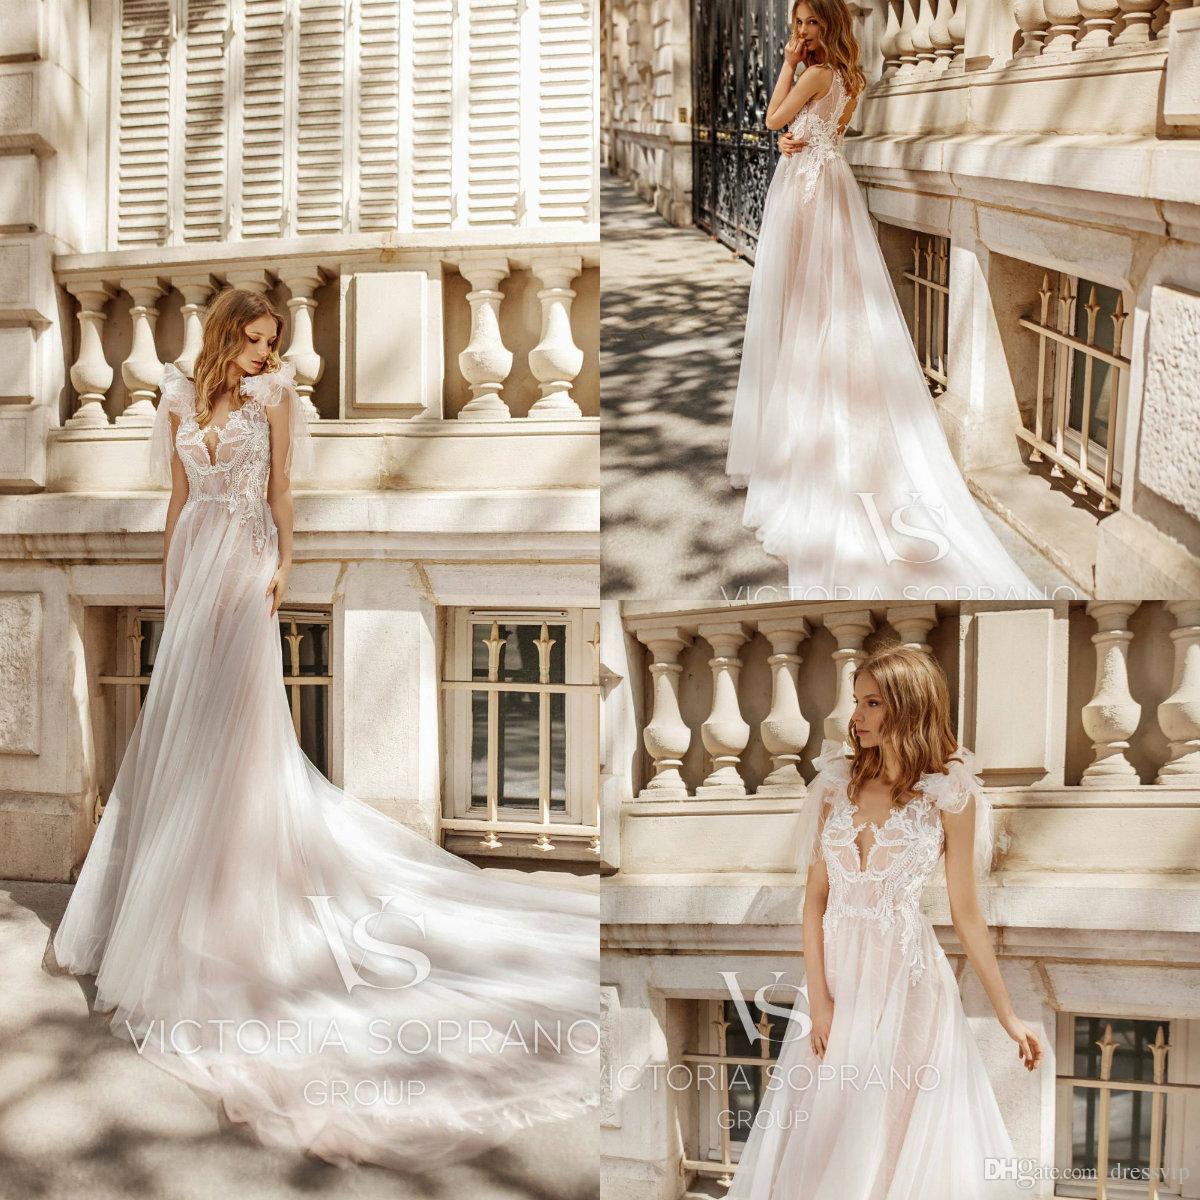 Blush Beach Wedding Dresses Spaghetti Bow Lace Appliques Long Train Hollow Back Cheap Boho Wedding Dress Summer Western Bridal Gowns